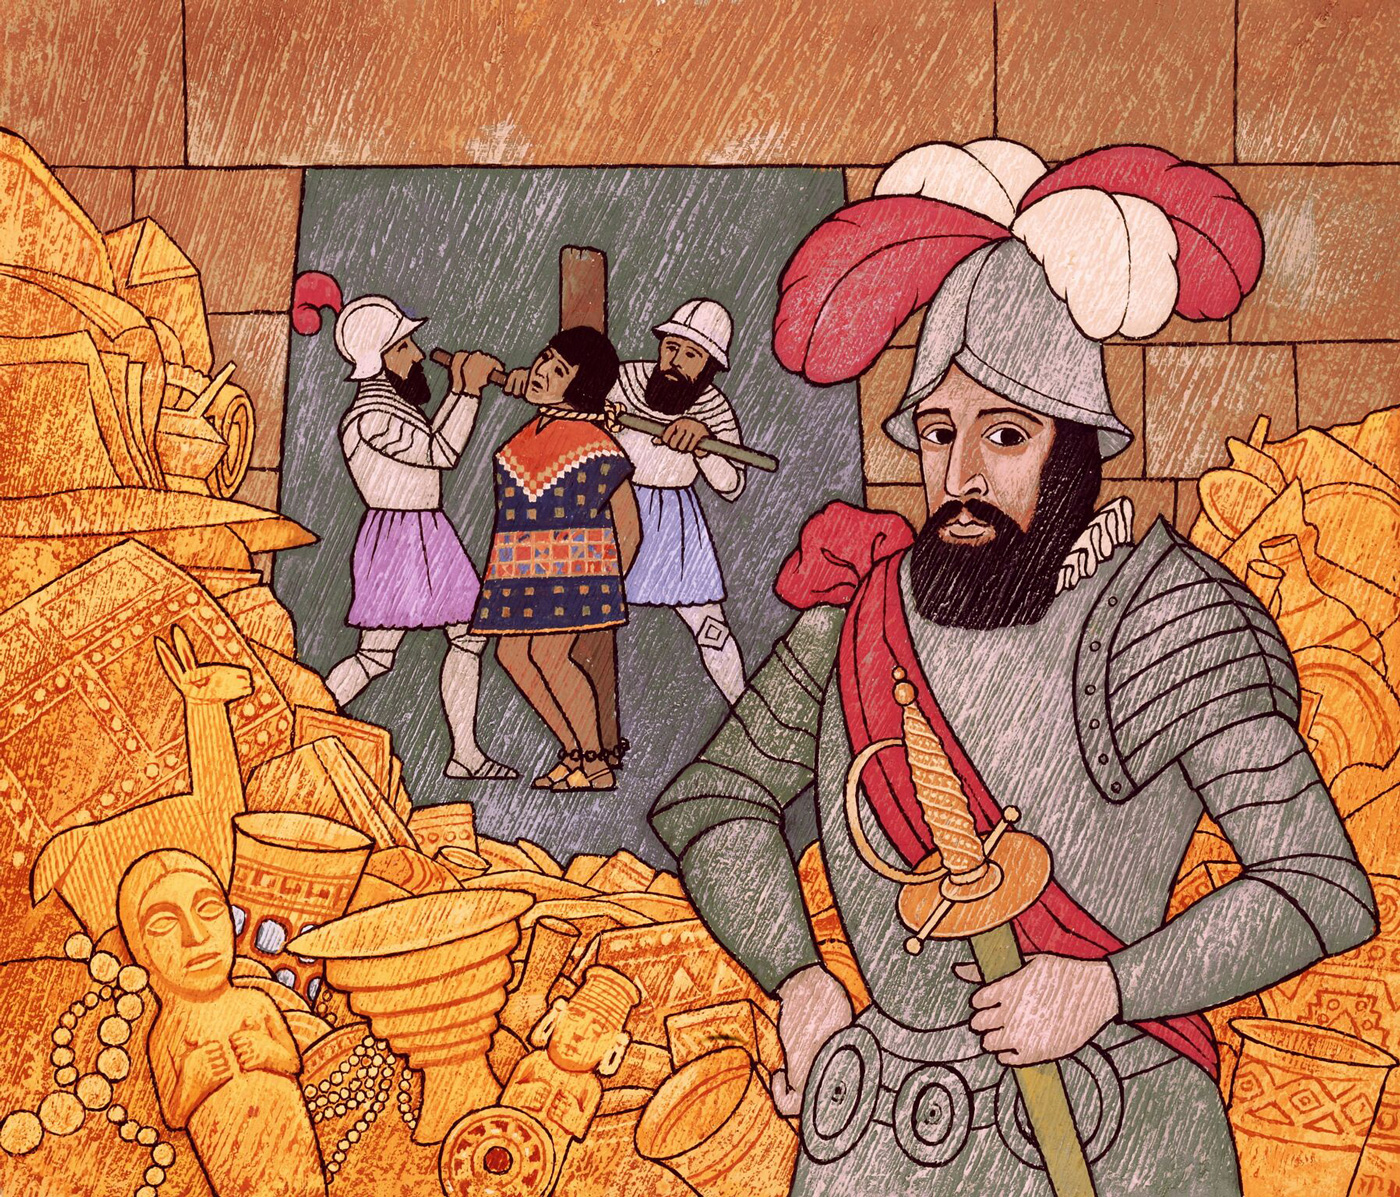 Illustrated is Spanish conquistador Francisco Pizarro, putting to death the last Inca emperor Atahualpa.